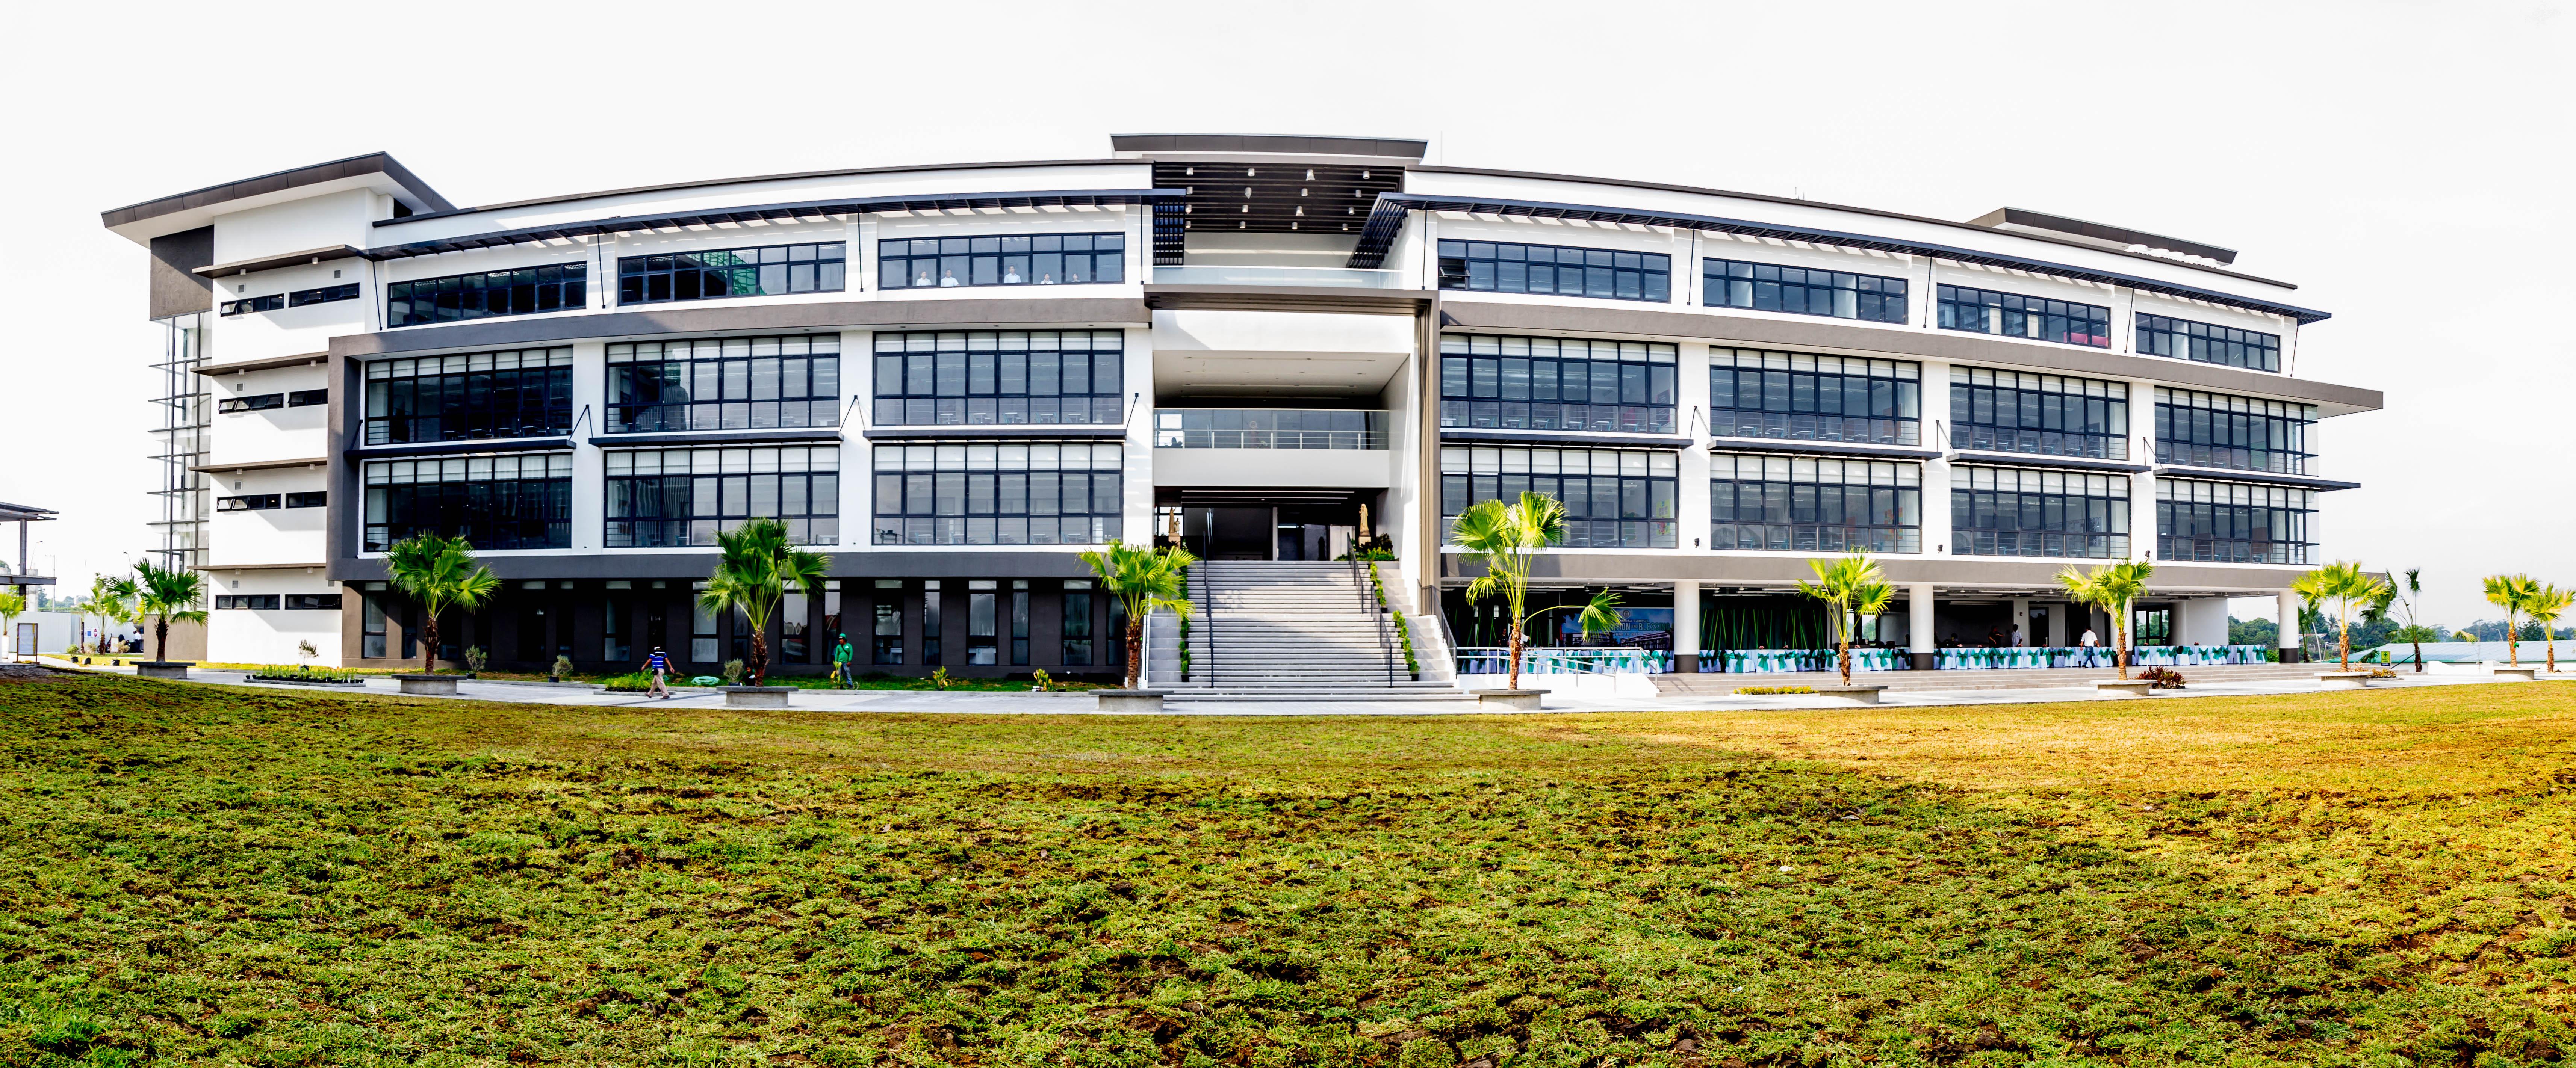 The Senior High School Building